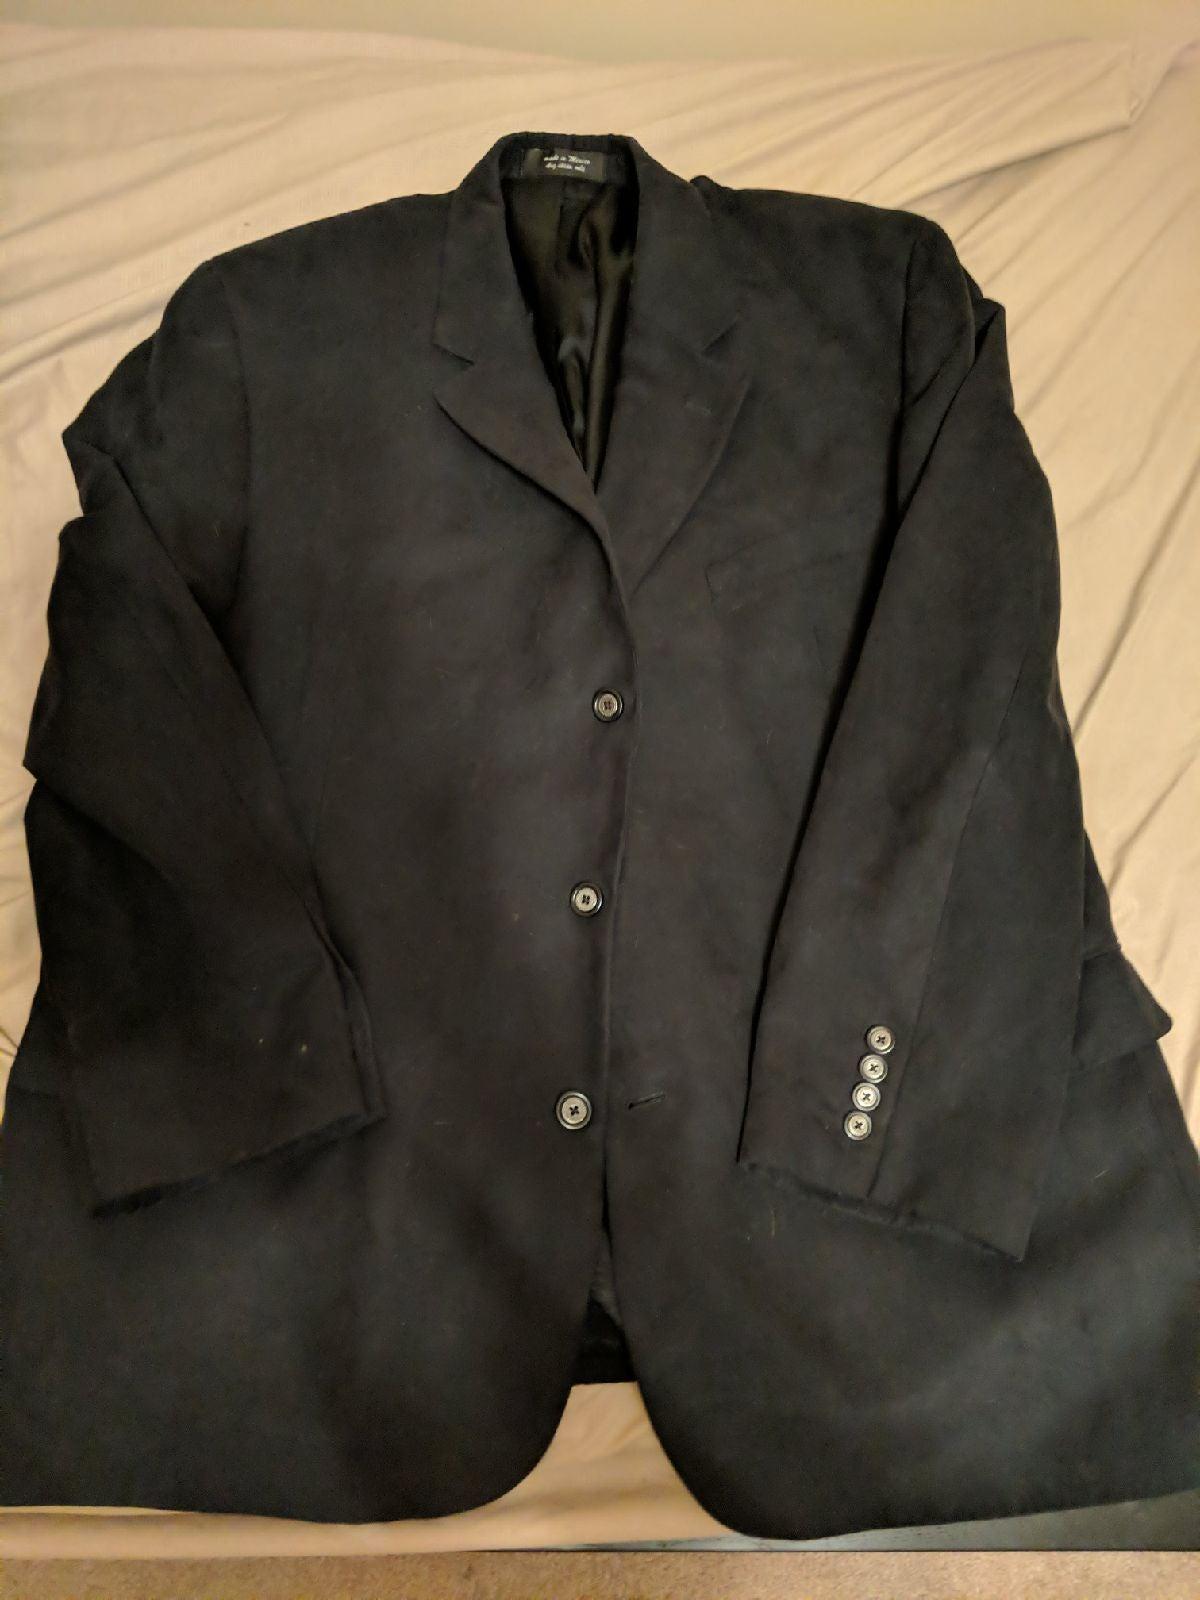 Sport coat and black